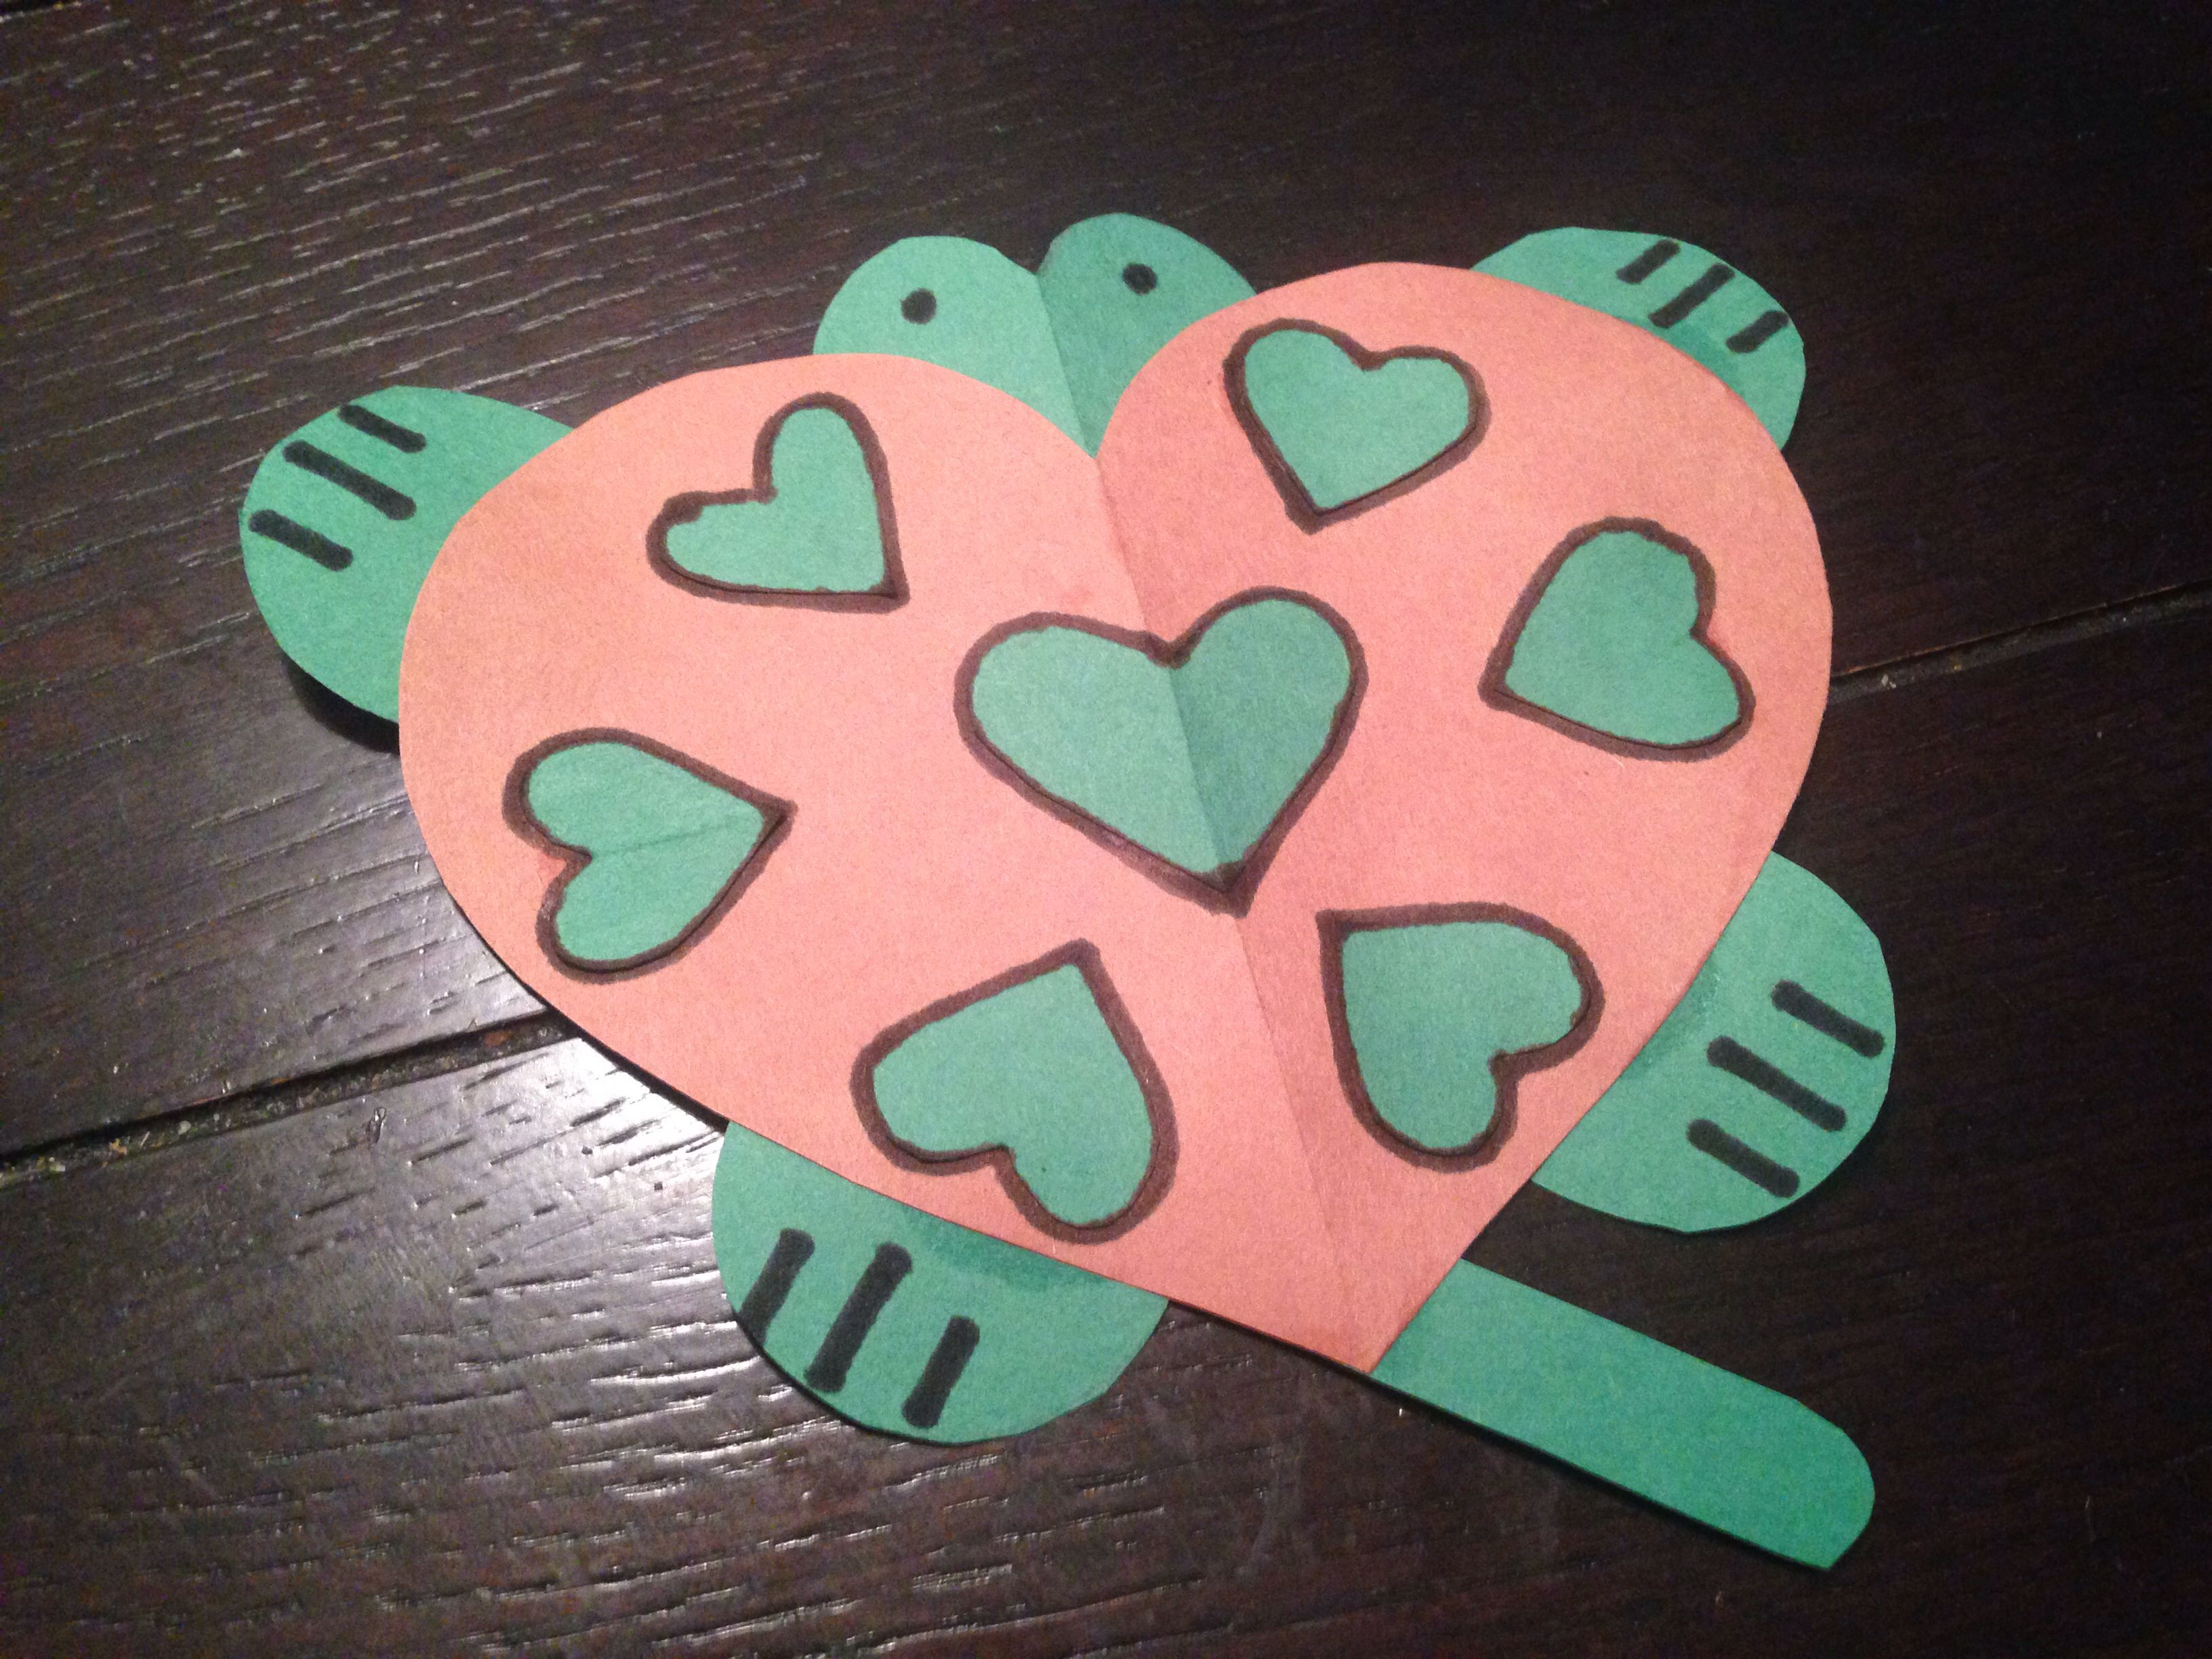 TURTLE HEART CRAFT | stuff | Pinterest | Heart crafts and ... - photo#21